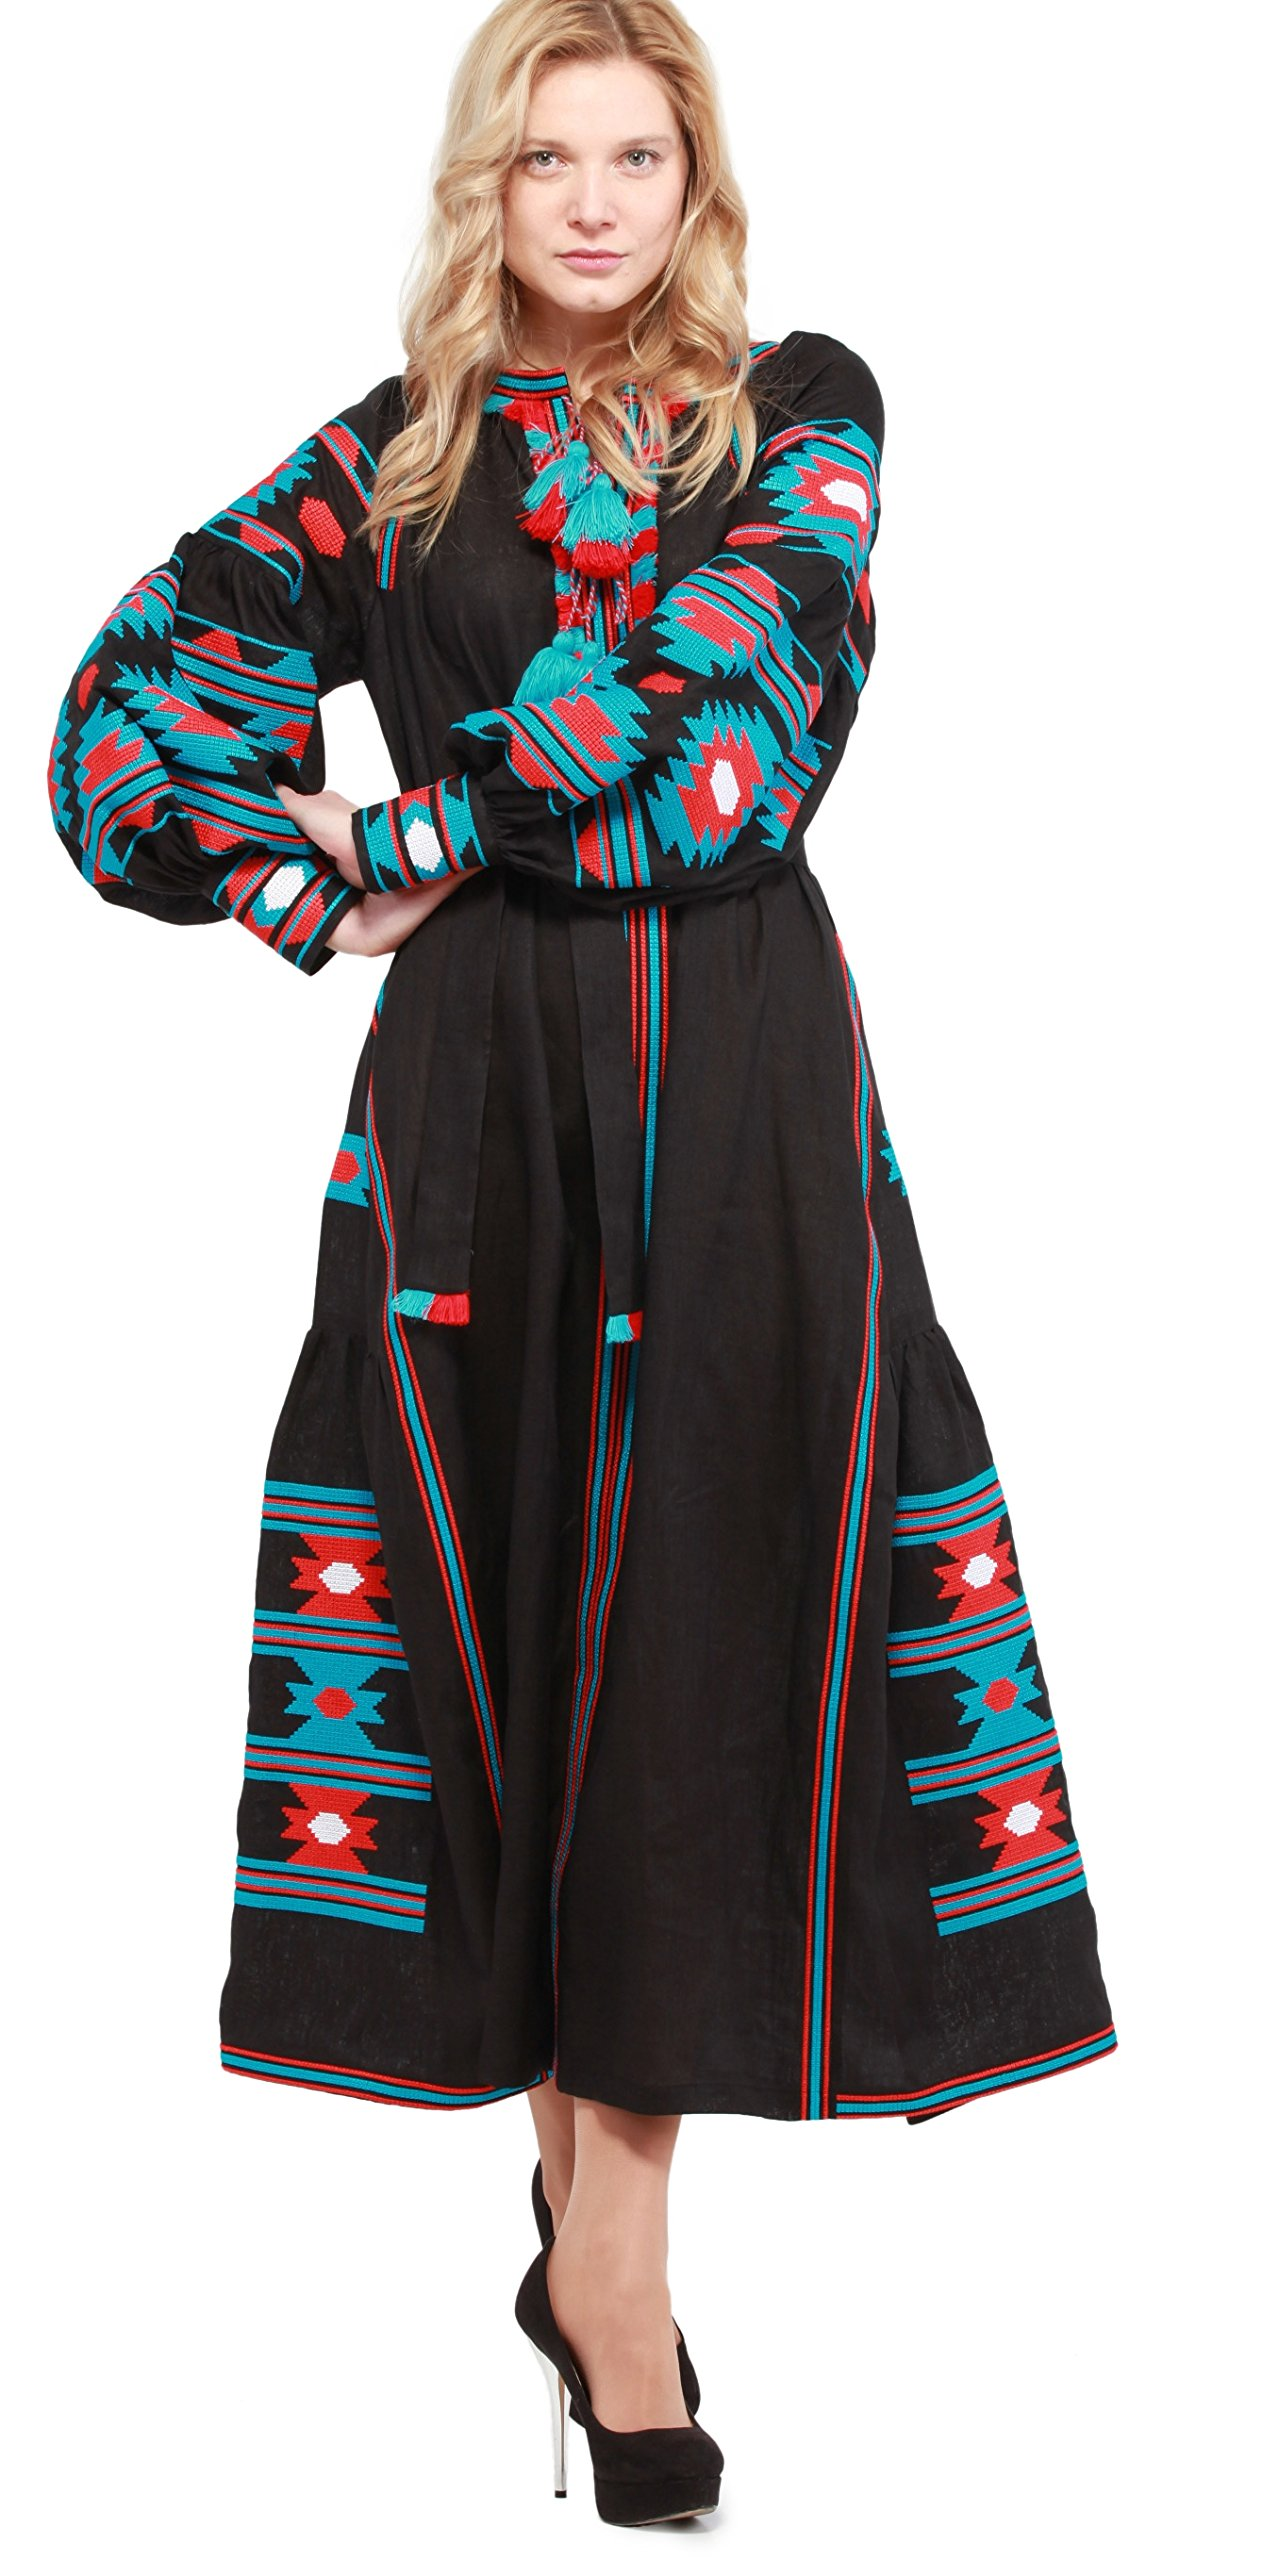 Boho Style Dress Embroidered Long Dress black woman. Vyshyvanka Ukrainian (L, 130cm black) by Boho Style Dress